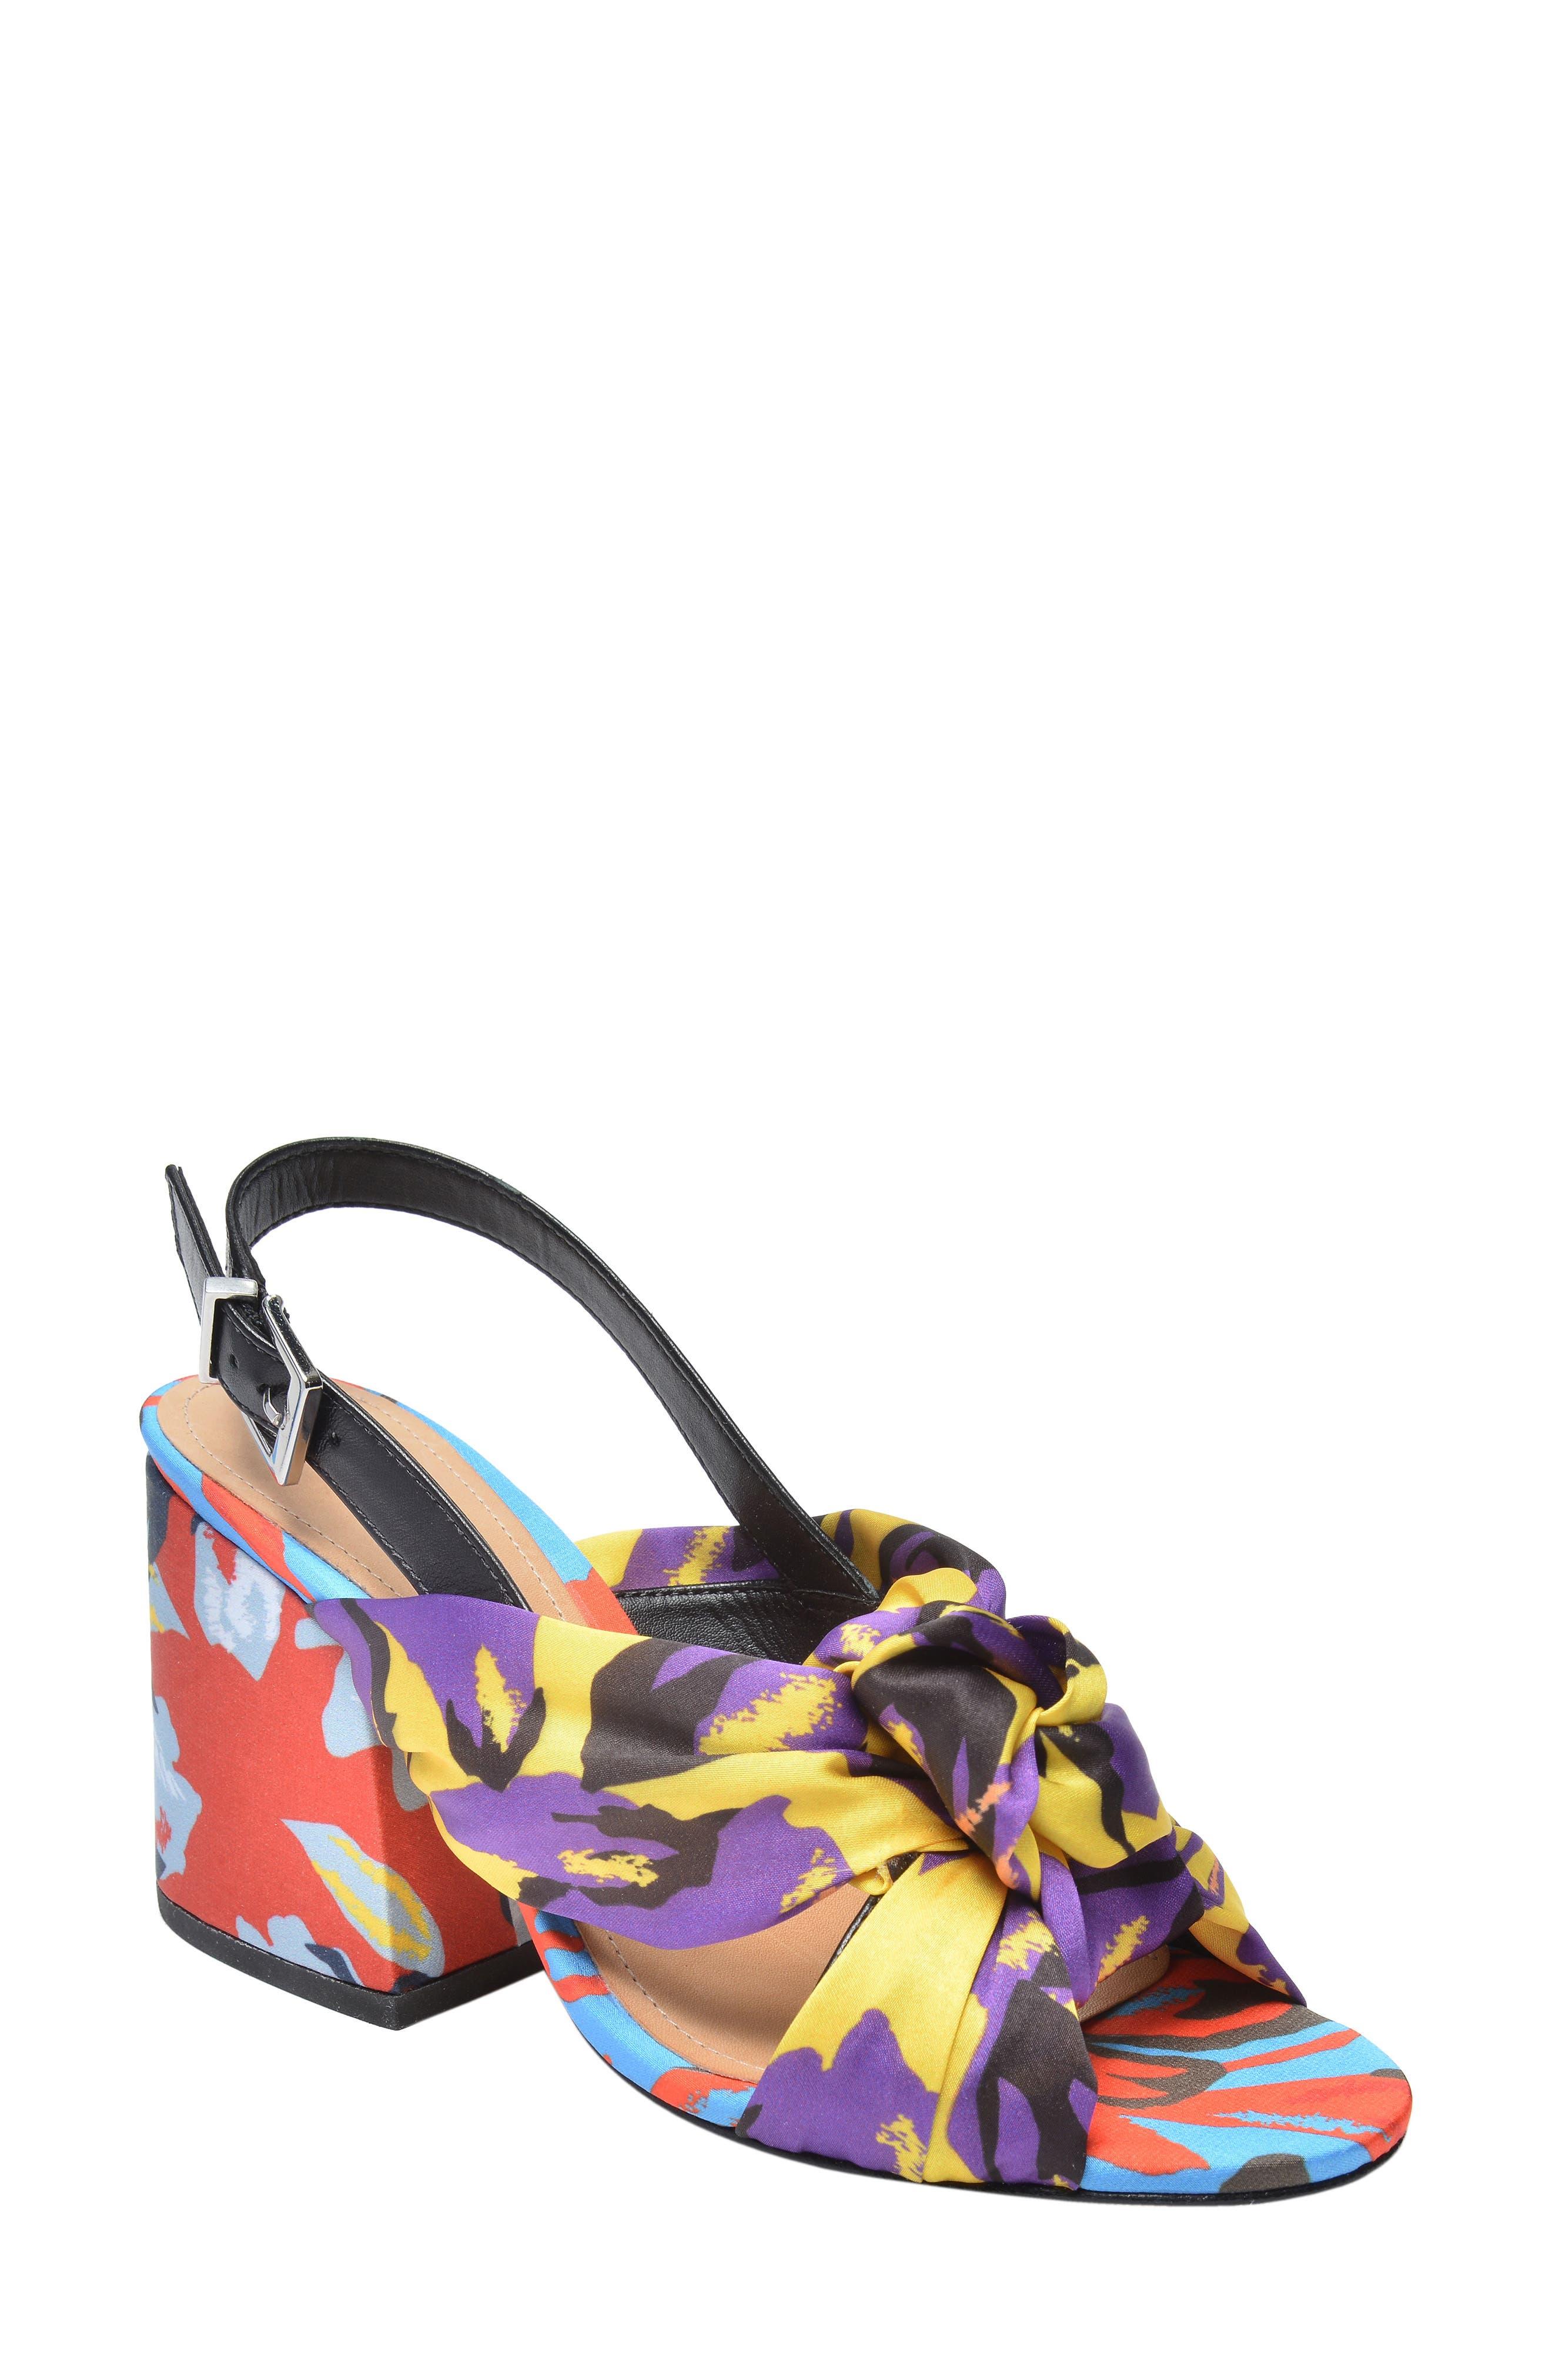 x Adriana Lima Sandal,                             Main thumbnail 1, color,                             Floral Print Fabric